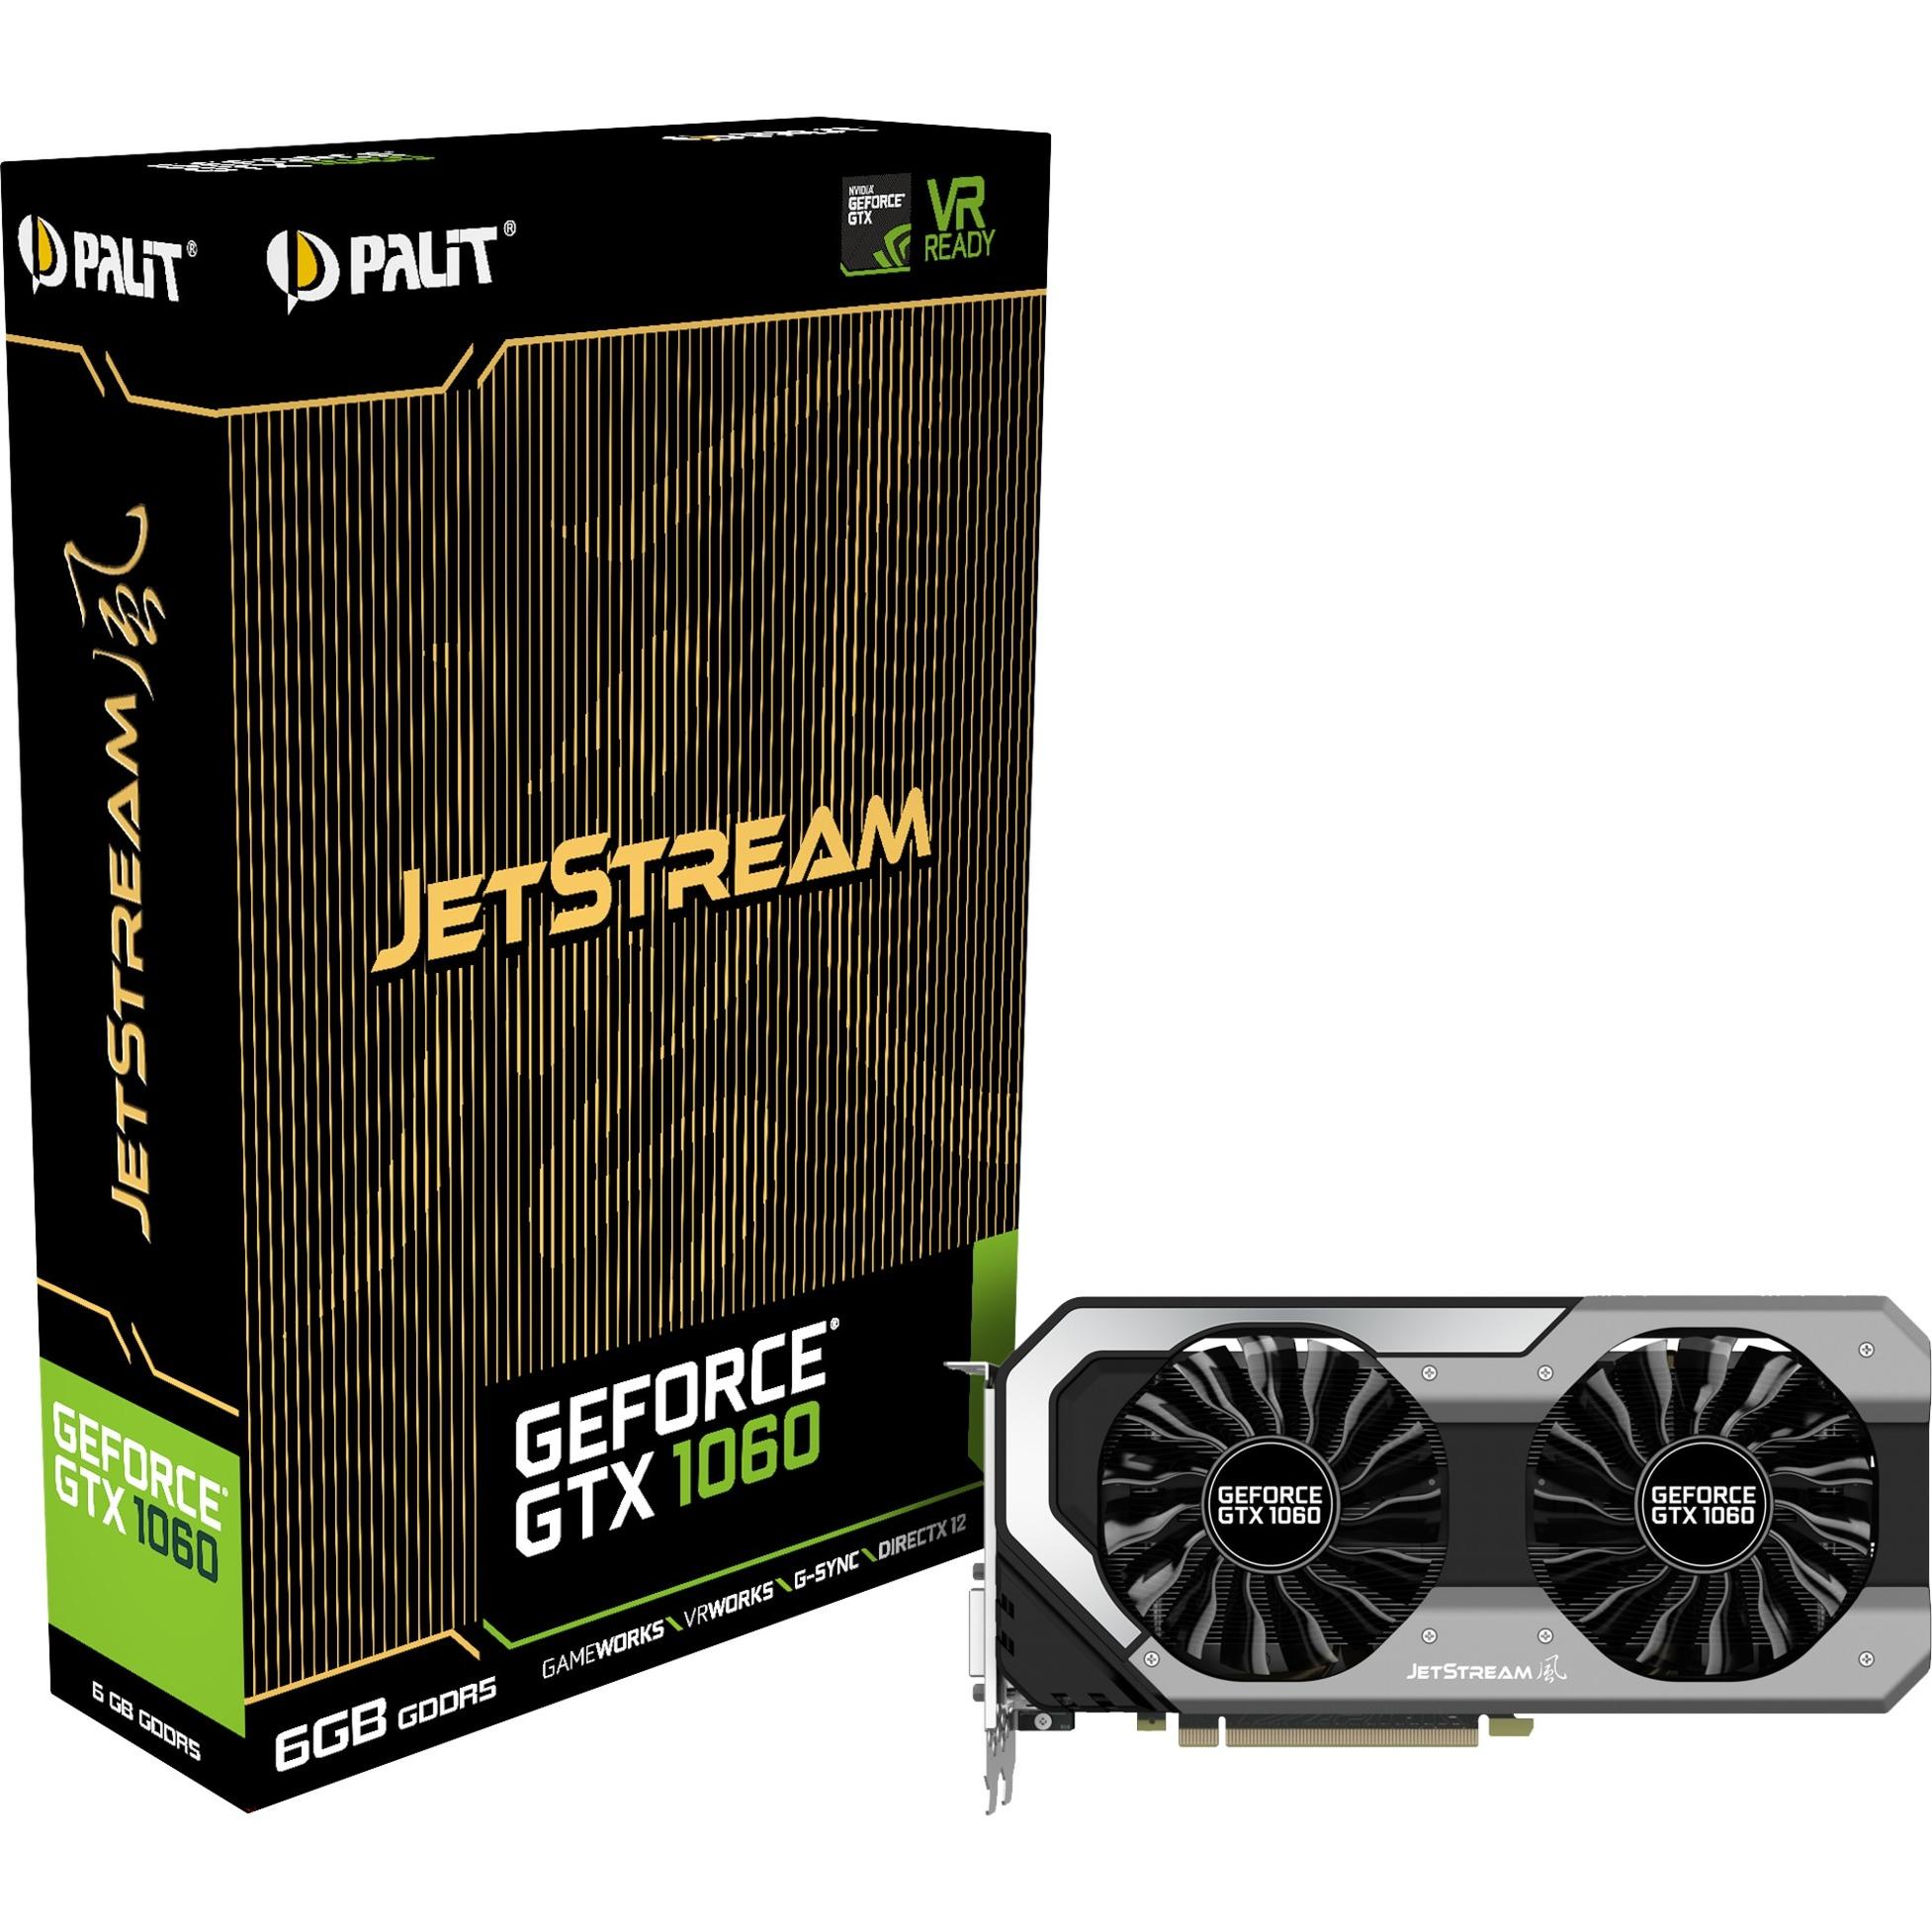 GeForce GTX 1060 JetStream GeForce GTX 1060 6GB GDDR5, Tarjeta gráfica